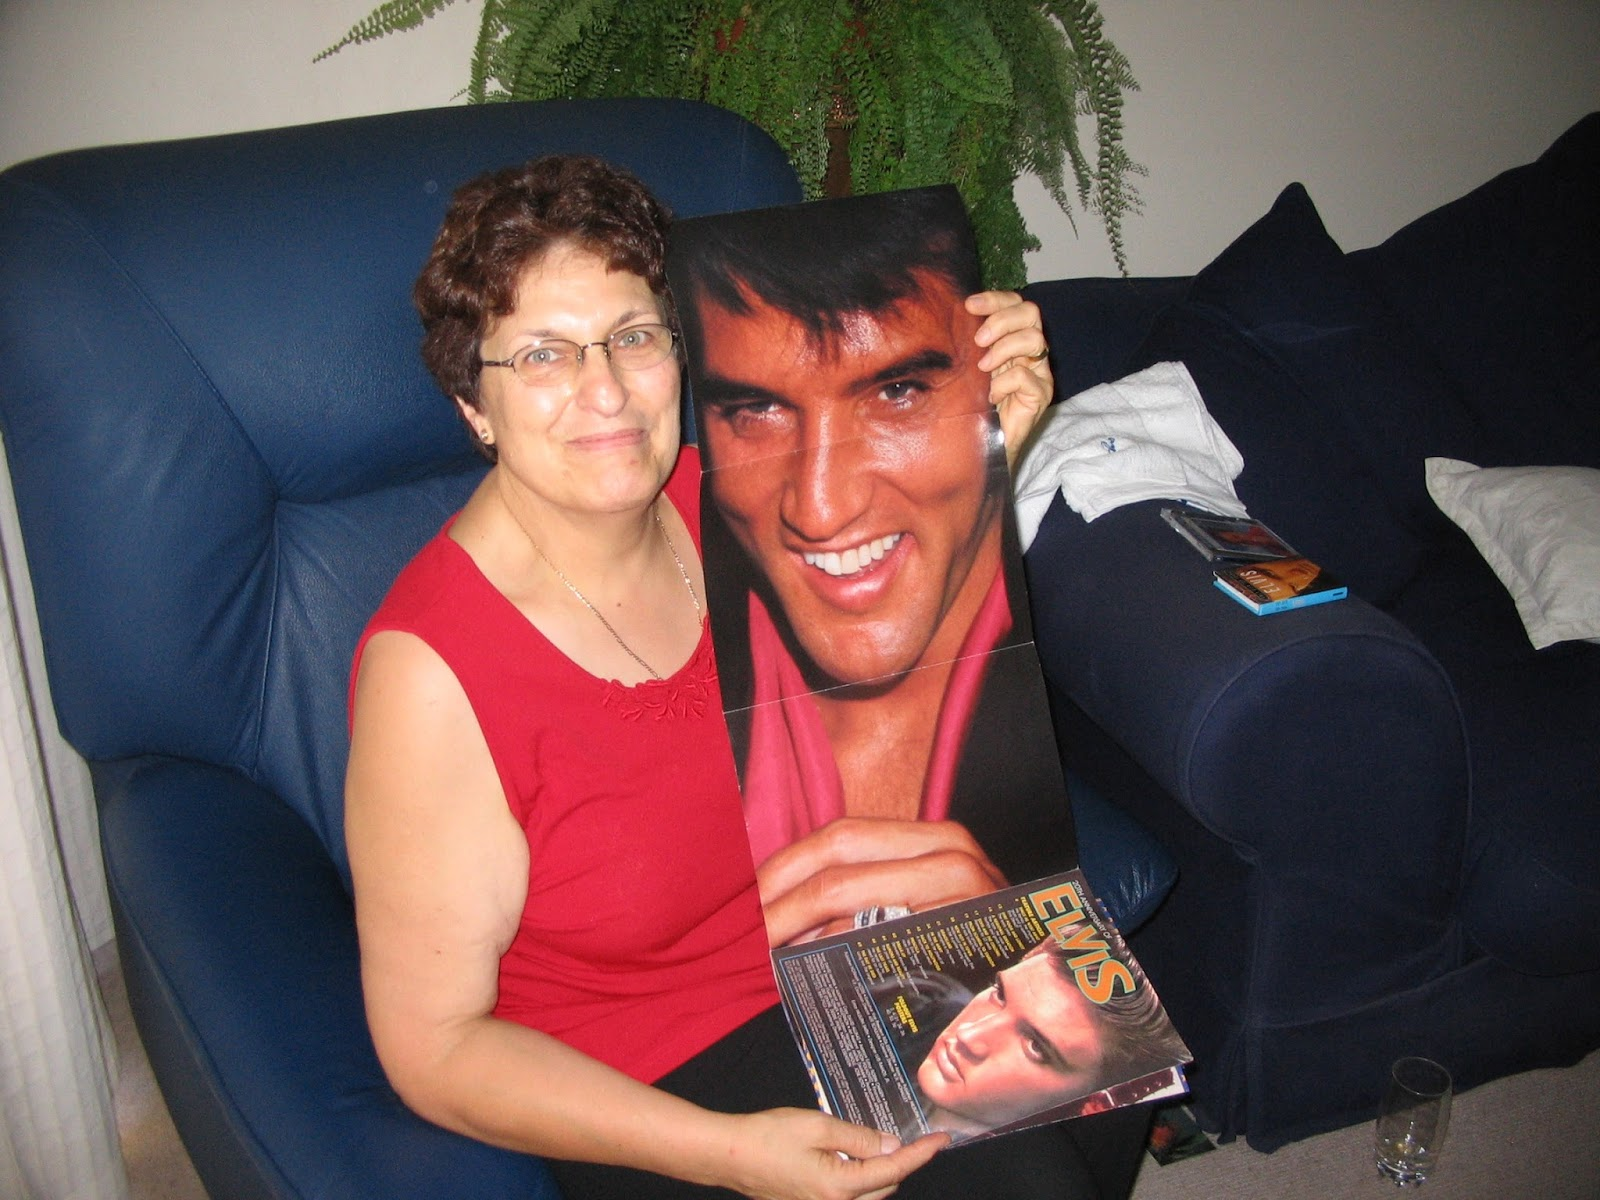 Elvis fan with Elvis picture